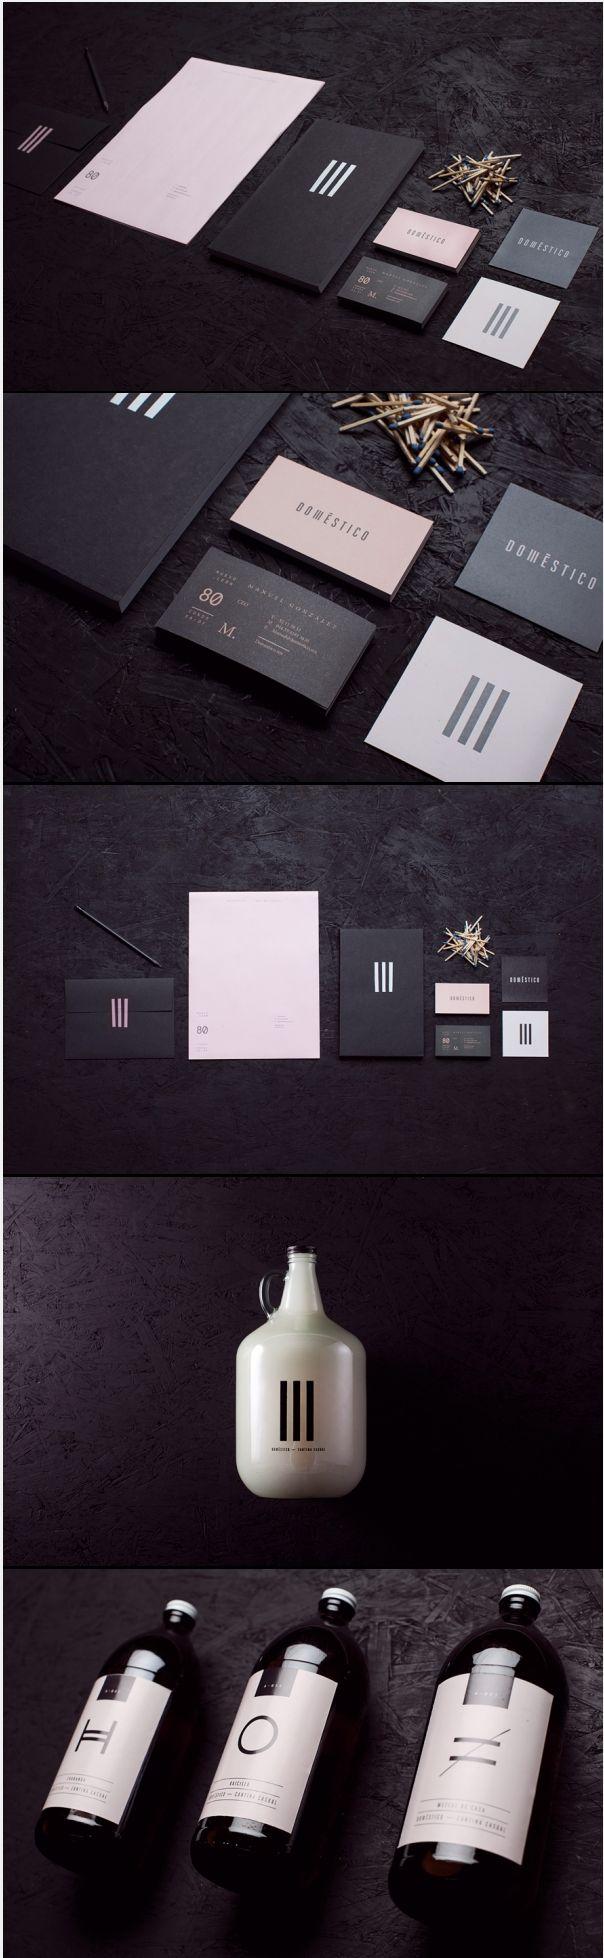 Cool Brand Identity Design on the Internet. Domestico. #branding #brandidentity #identitydesign @ http://www.pinterest.com/alfredchong/brand-identity/